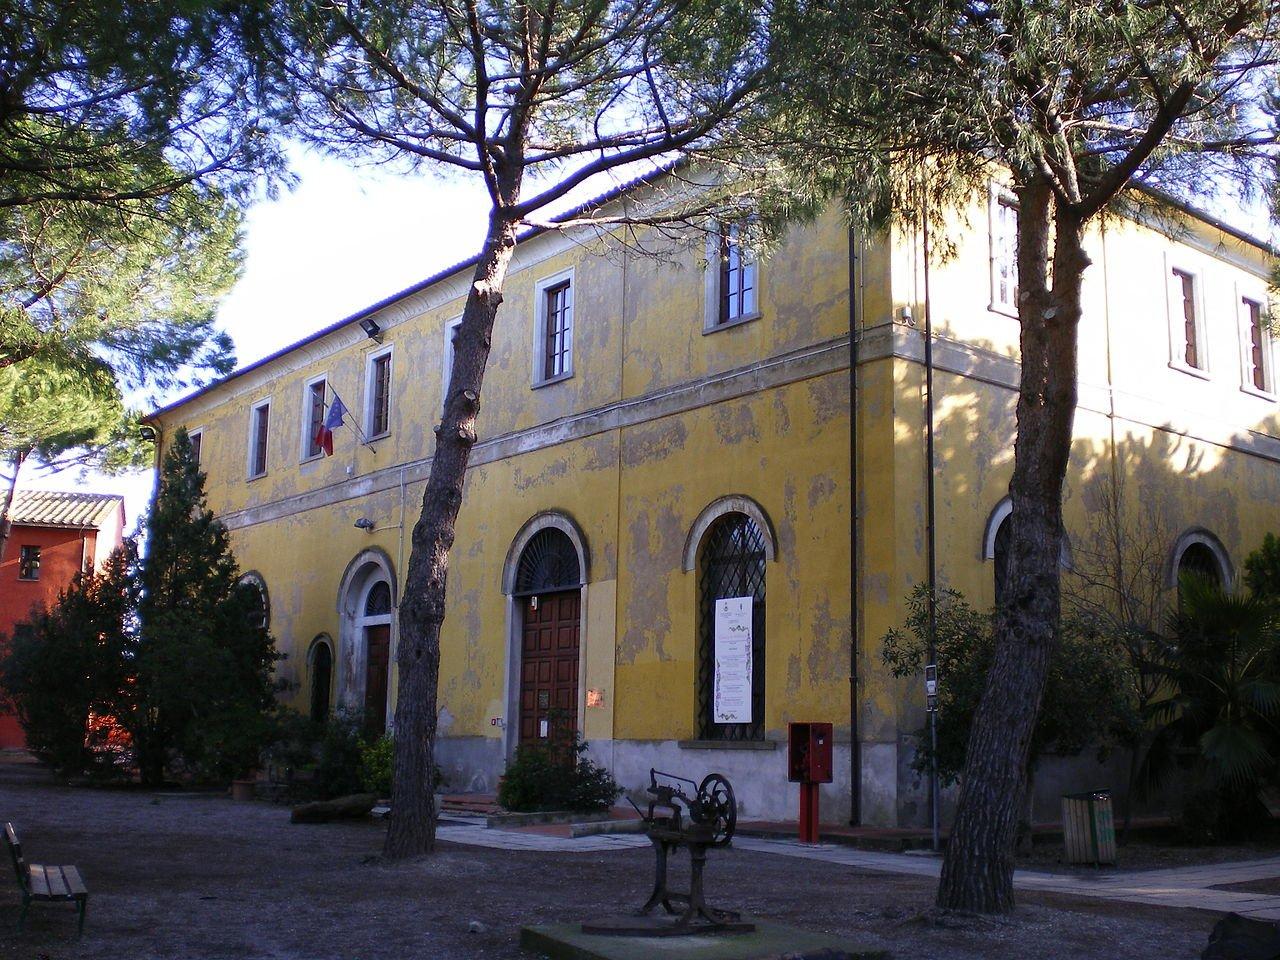 follonica-1280px-FollonicaBibliotecaComunale-Francesco-Babboni